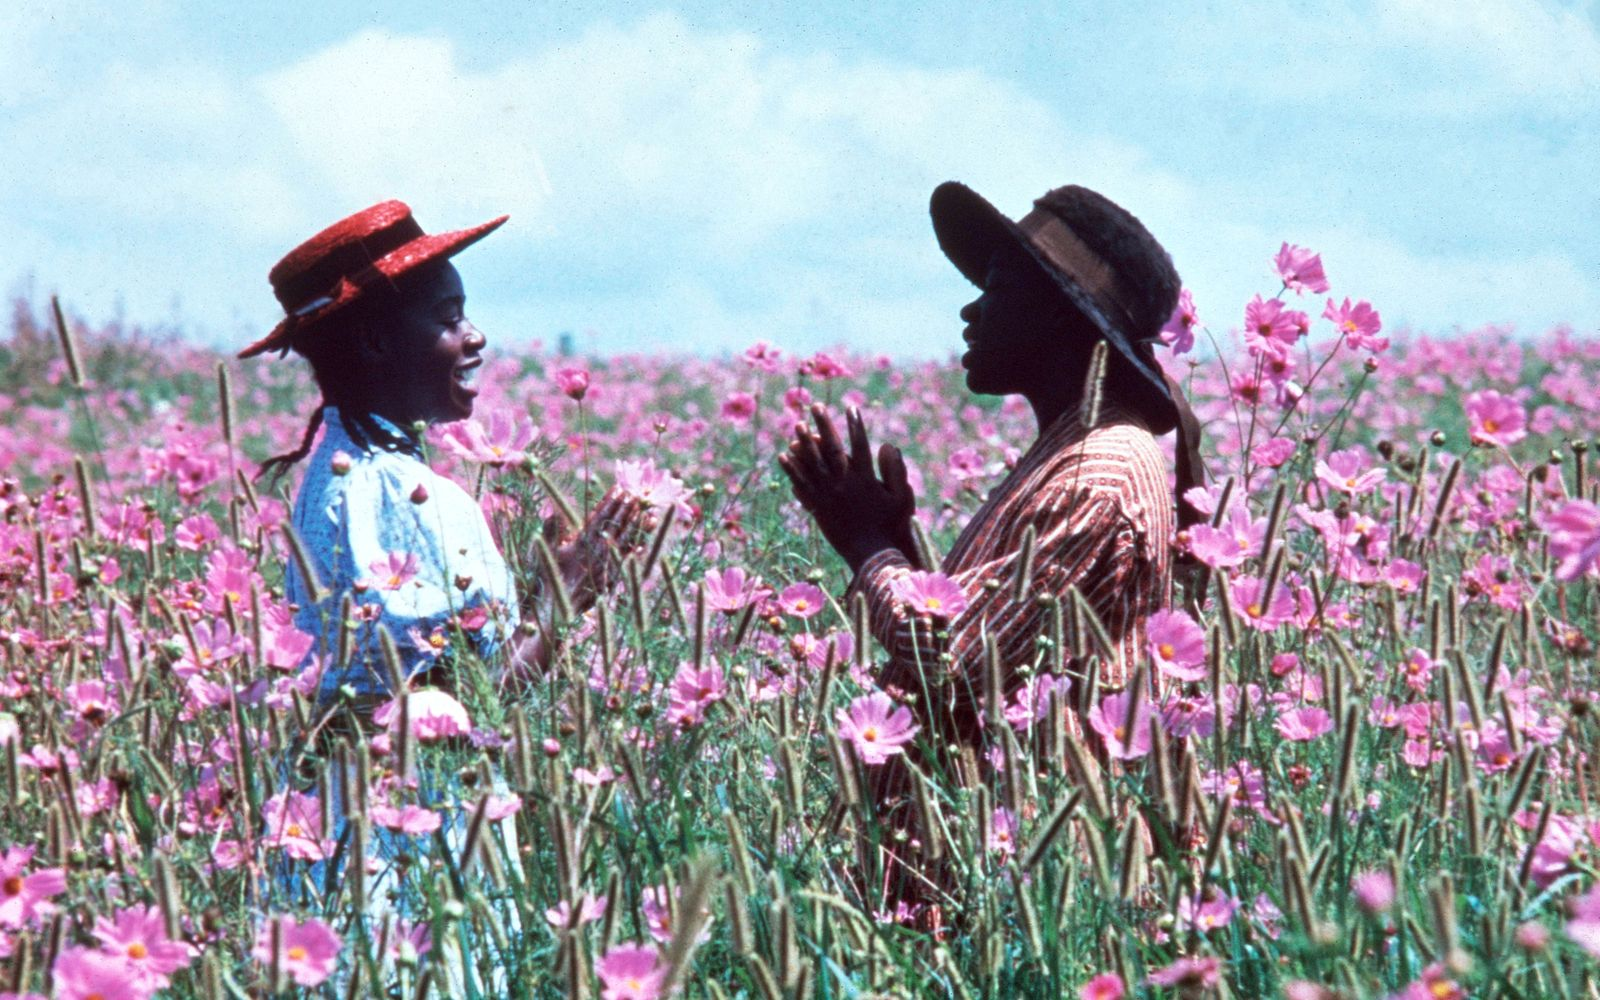 Akosua Busia and Desreta Jackson